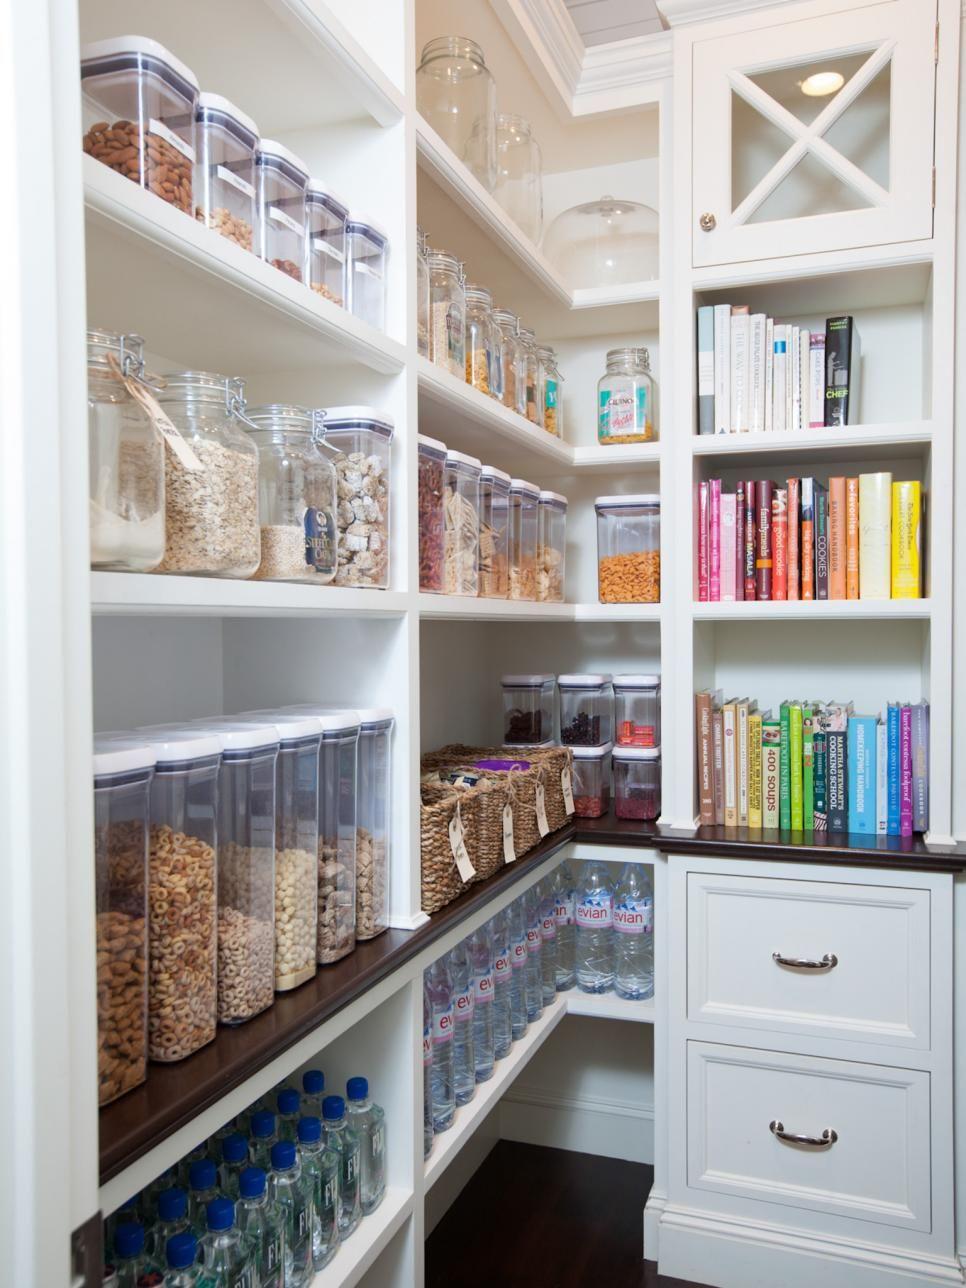 16 Small Pantry Organization Ideas | Stay fresh, Larder and ...